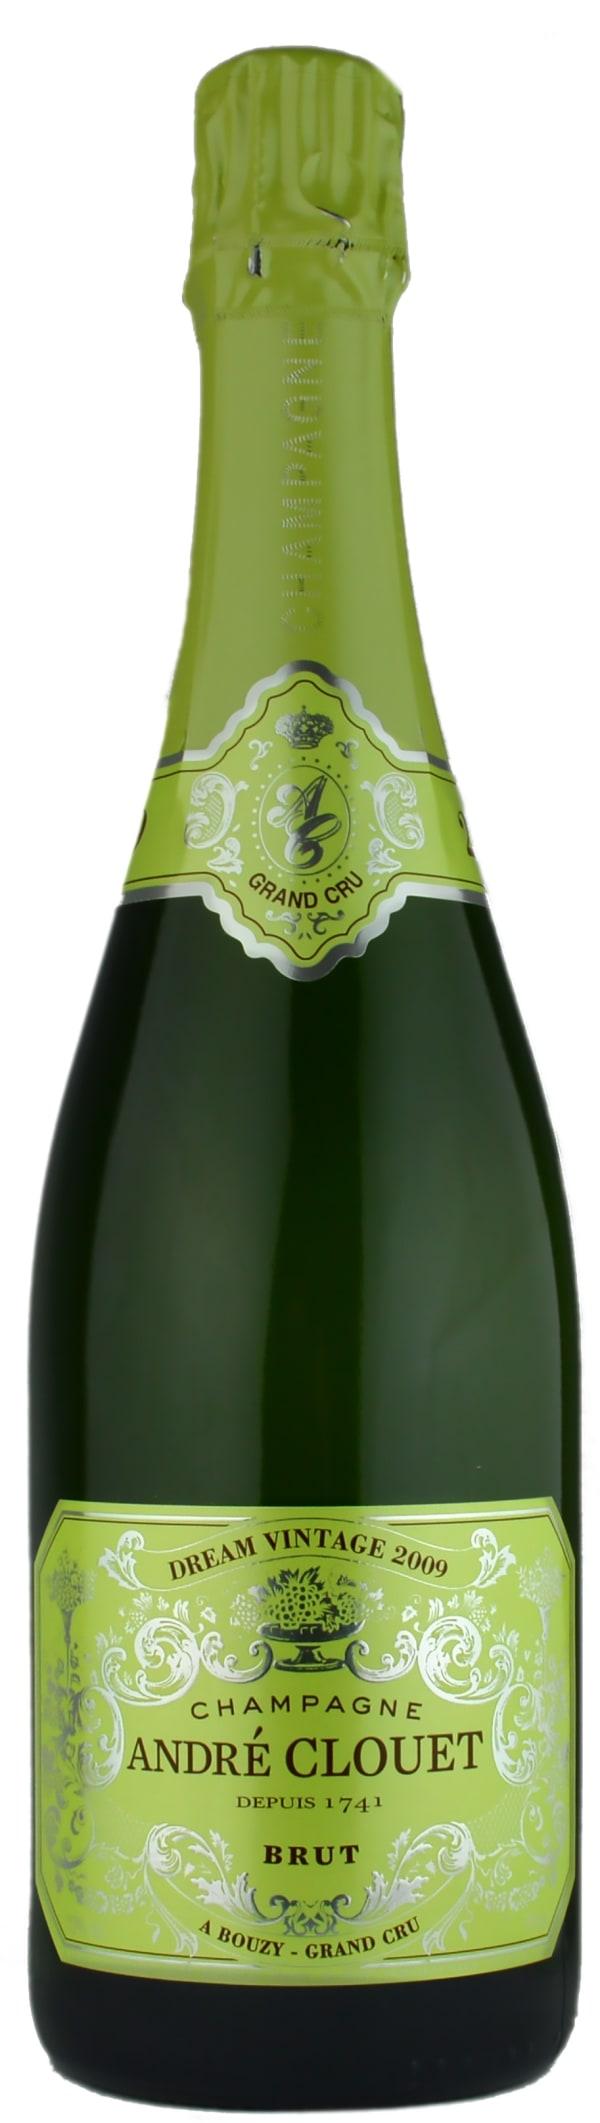 André Clouet Dream Vintage Grand Cru Champagne Brut 2009